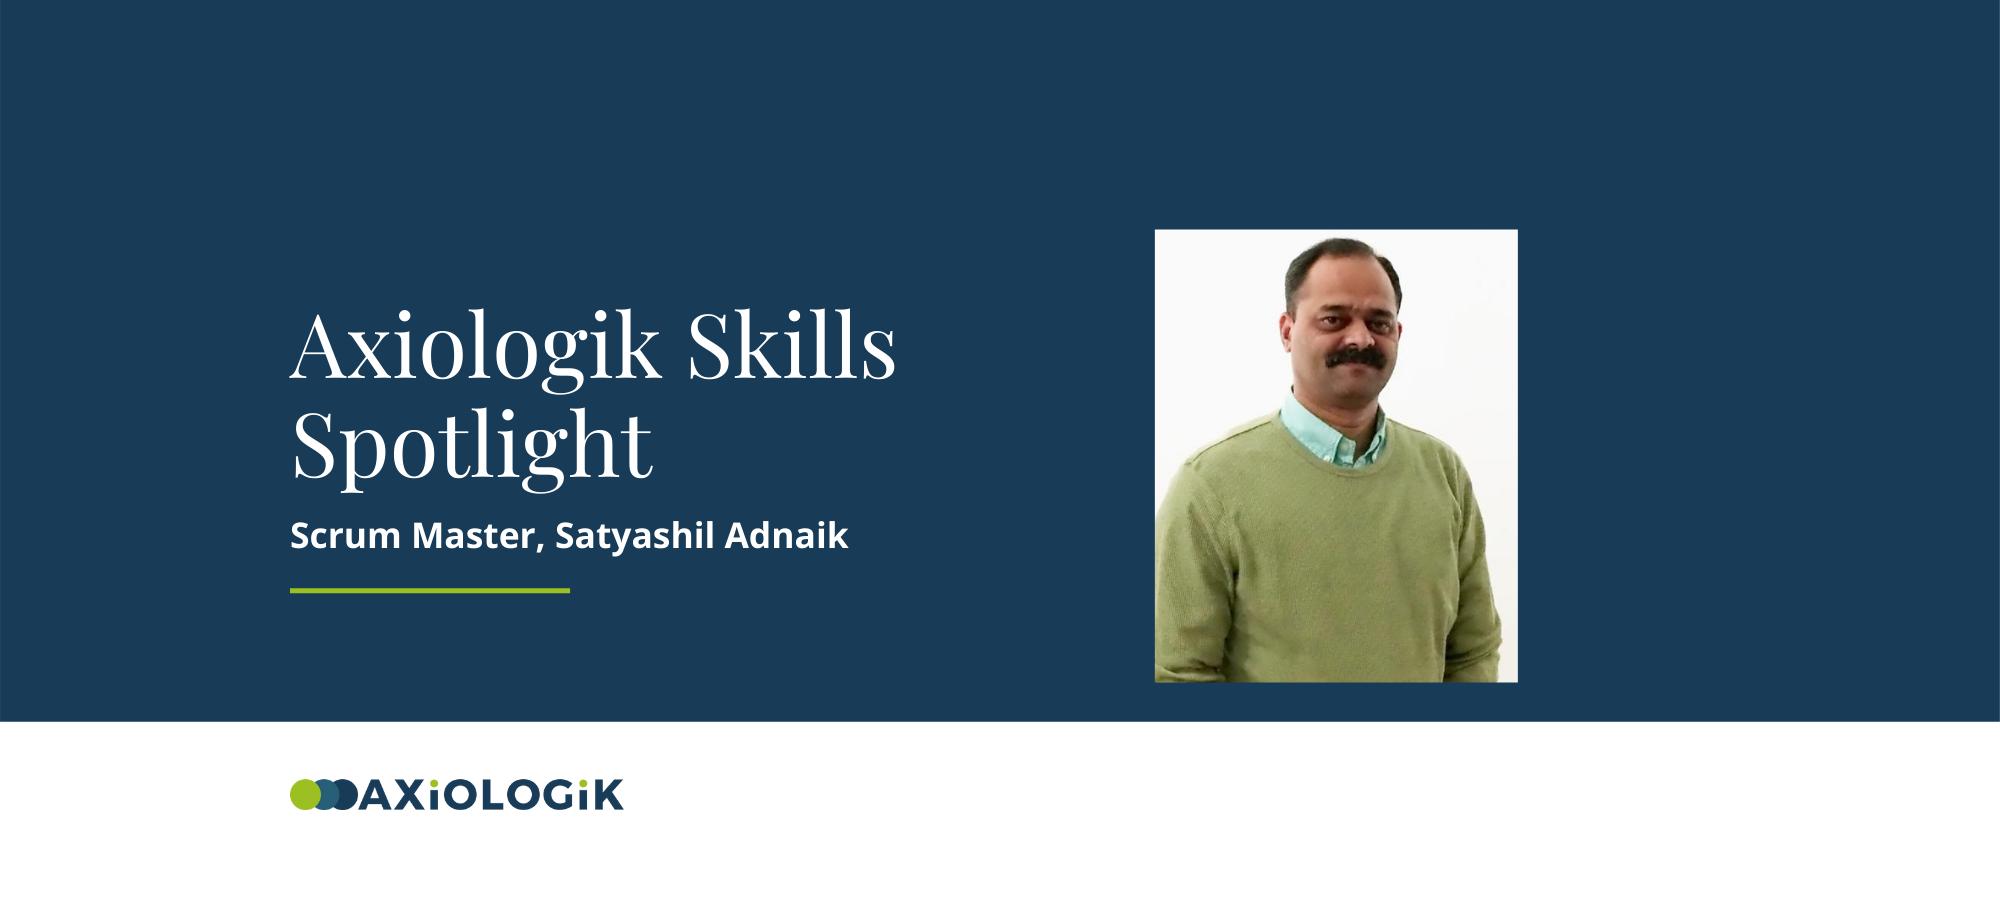 Axiologik Skills Spotlight: Satyashil Adnaik